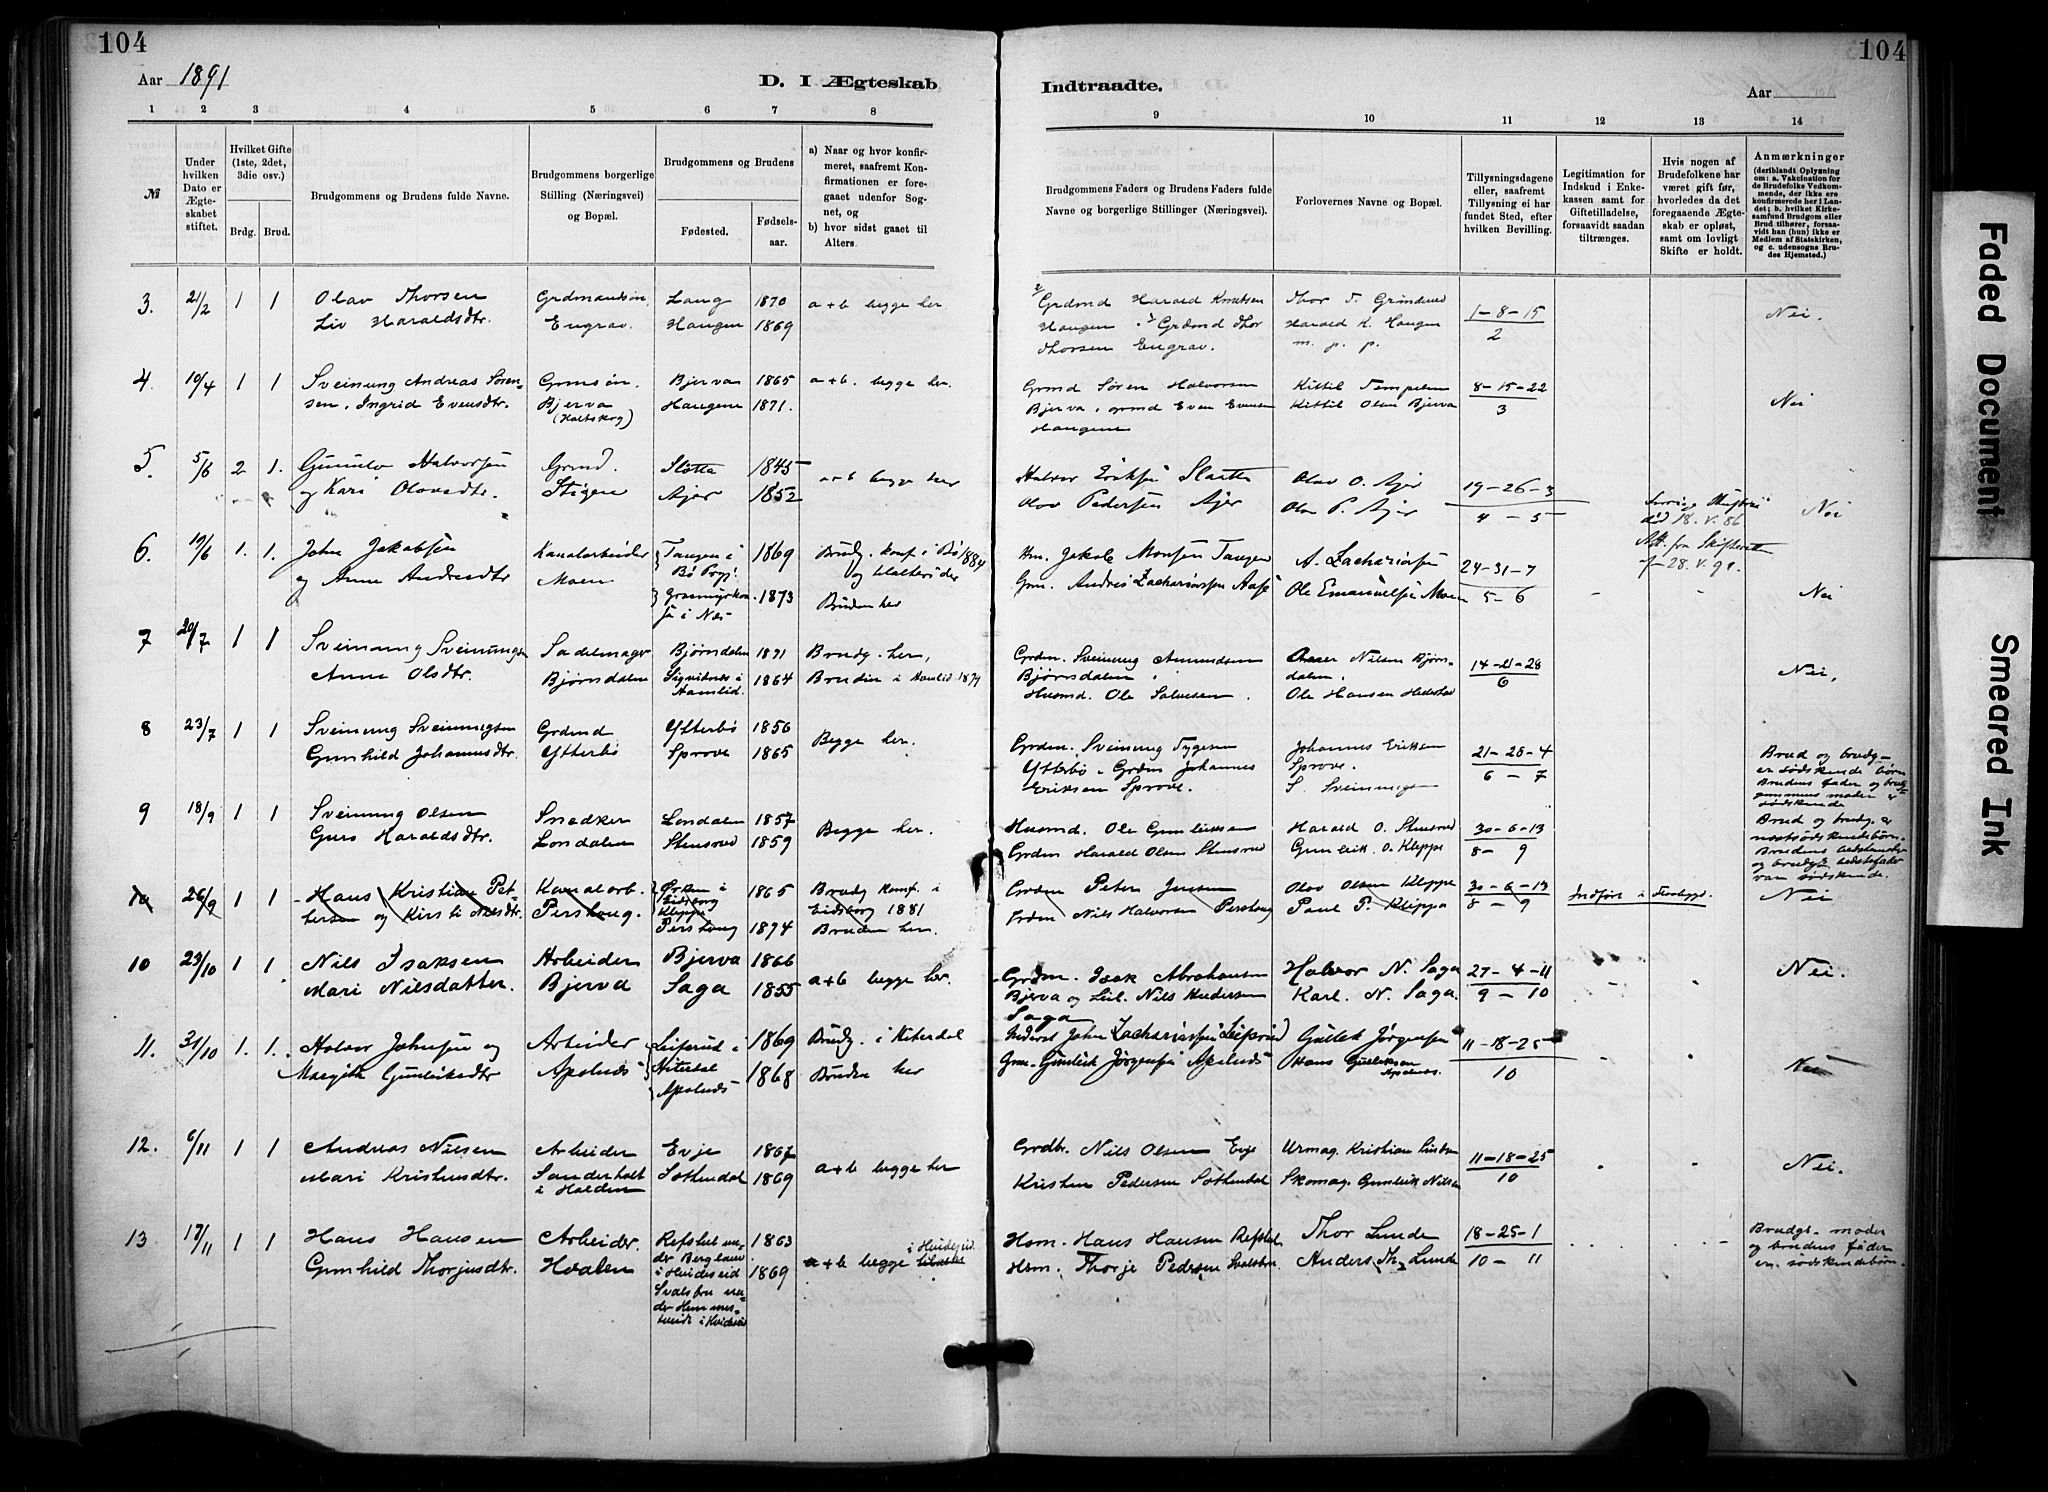 SAKO, Lunde kirkebøker, F/Fa/L0002: Ministerialbok nr. I 2, 1884-1892, s. 104